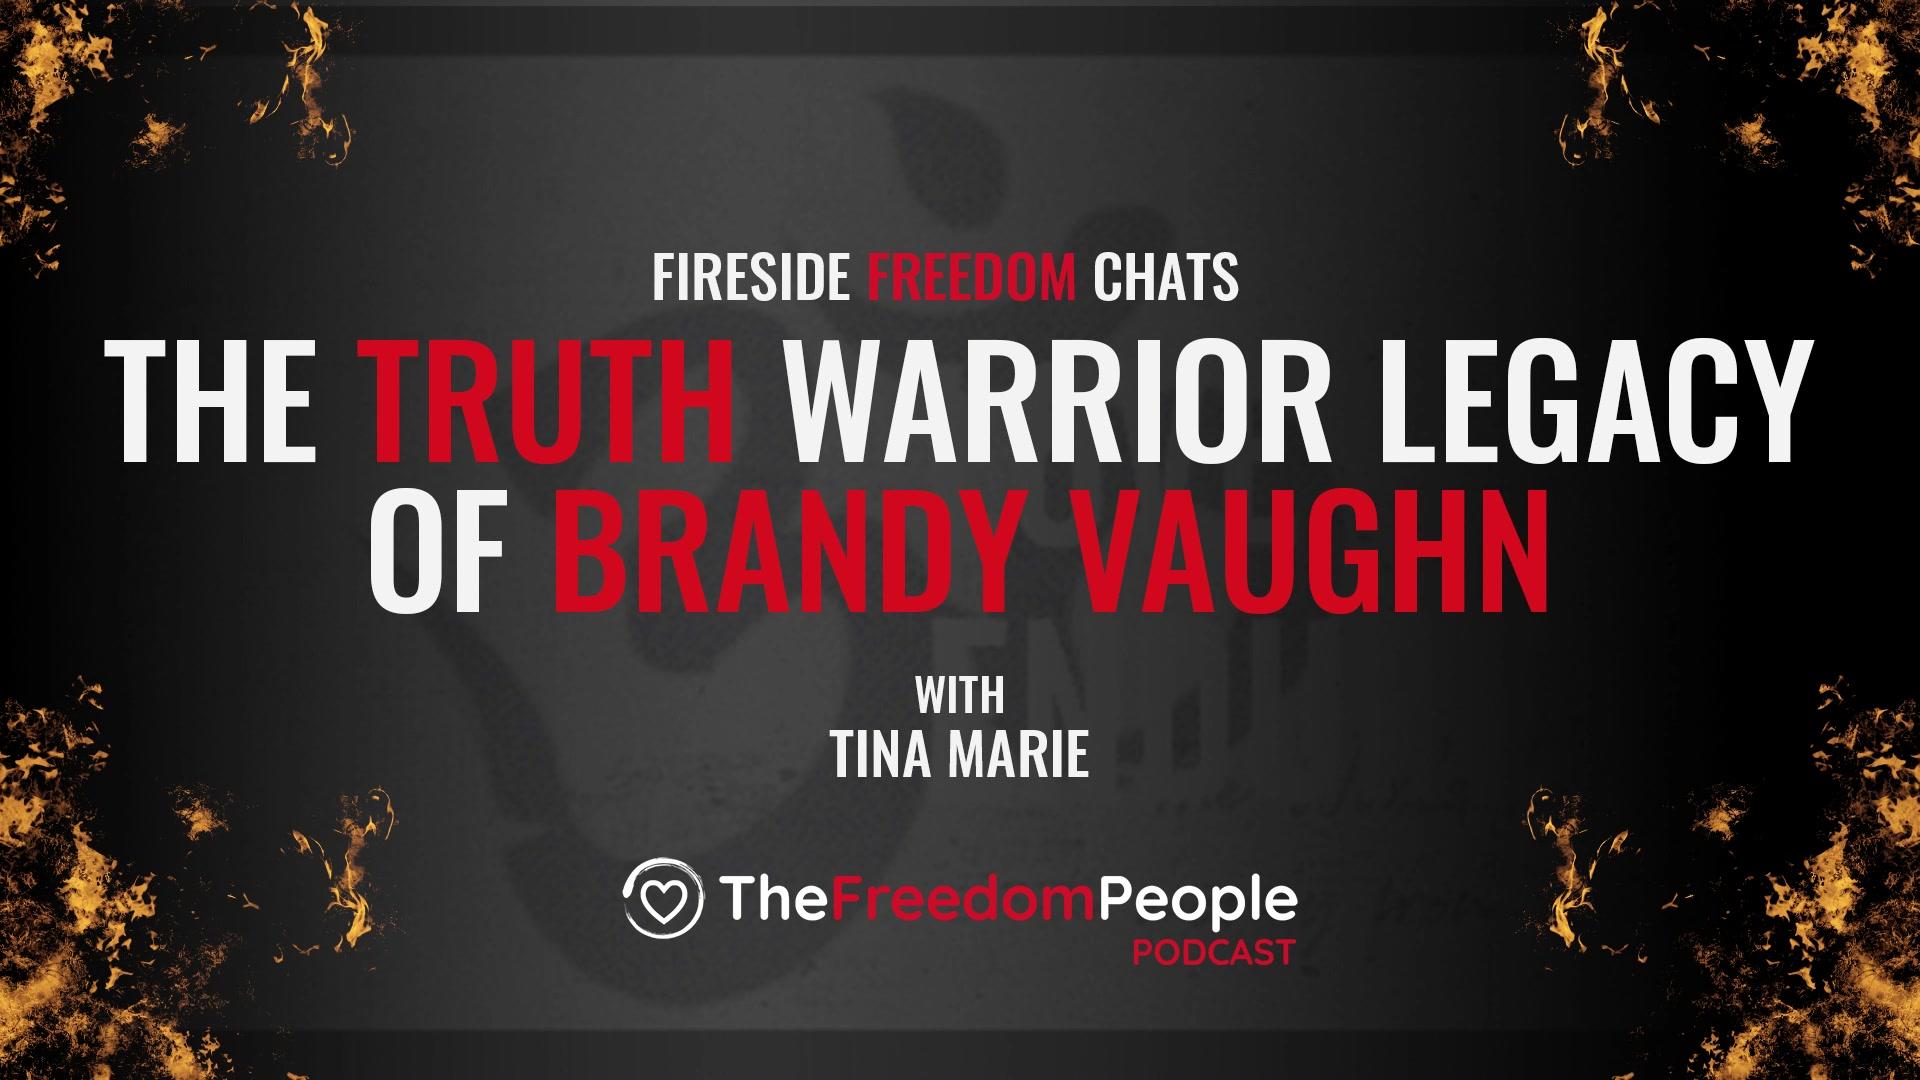 The Truth Warrior Legacy of Brandy Vaughn